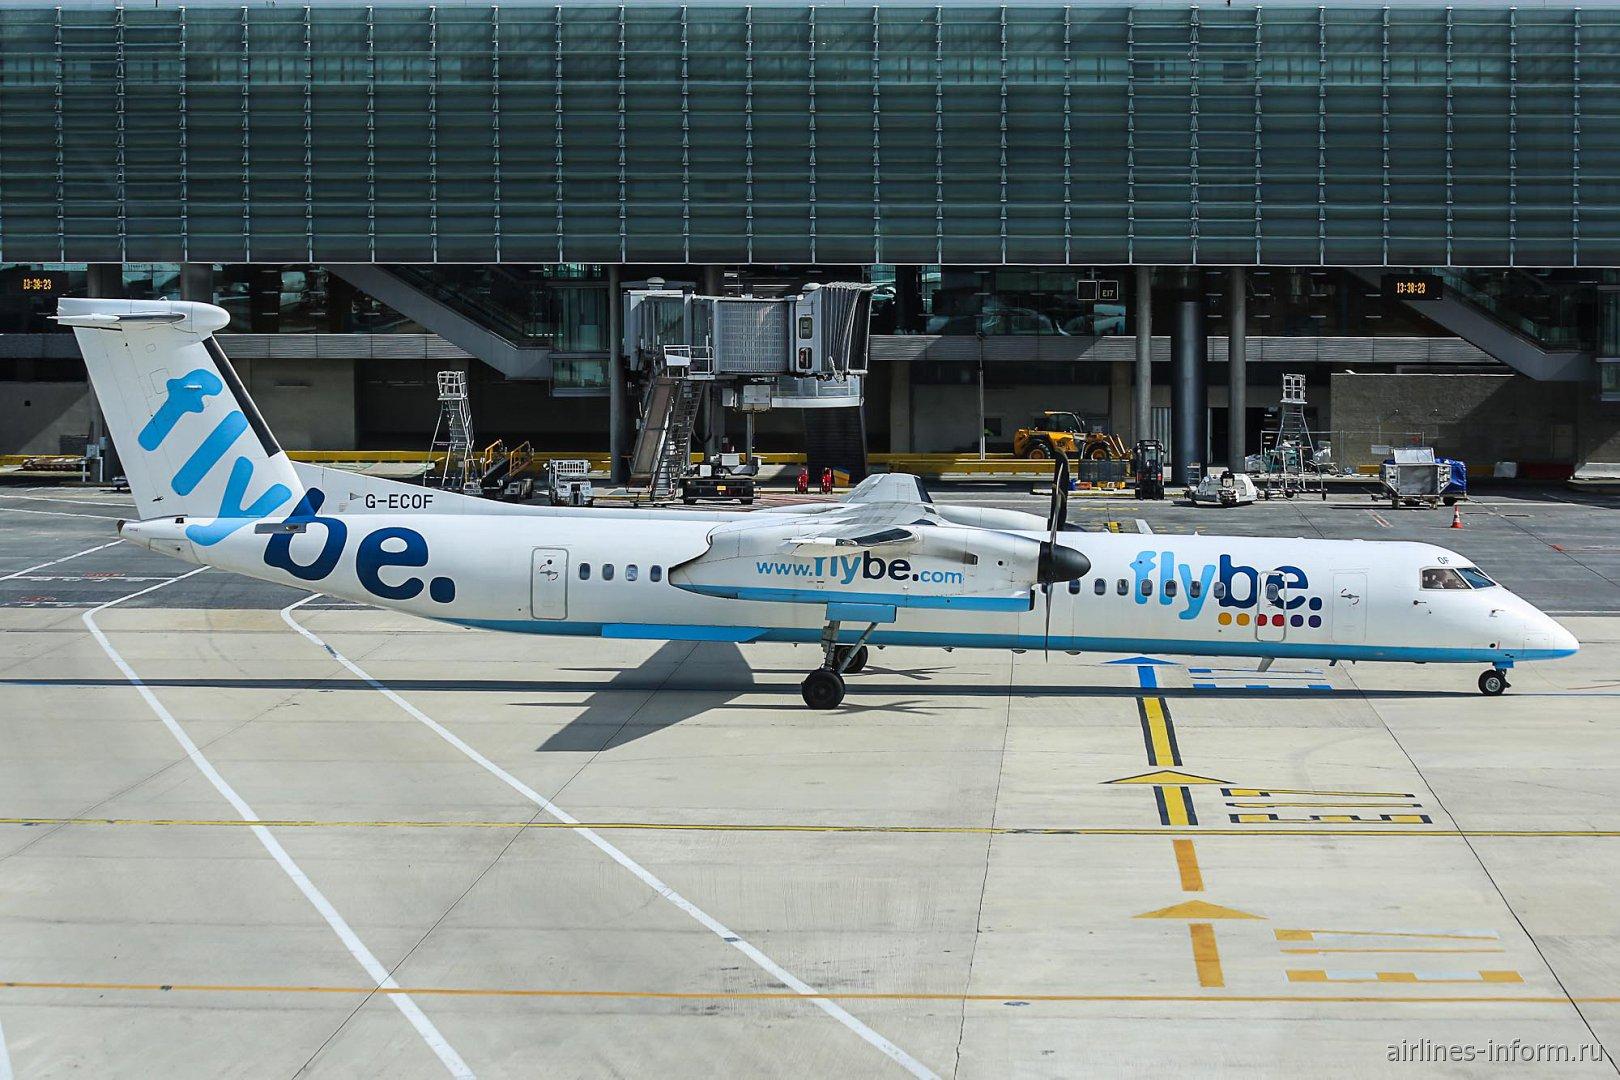 Bombardeir Dash 8-Q400 G-ECOF авиакомпании Flybe в аэропорту Париж Шарль-де-Голль